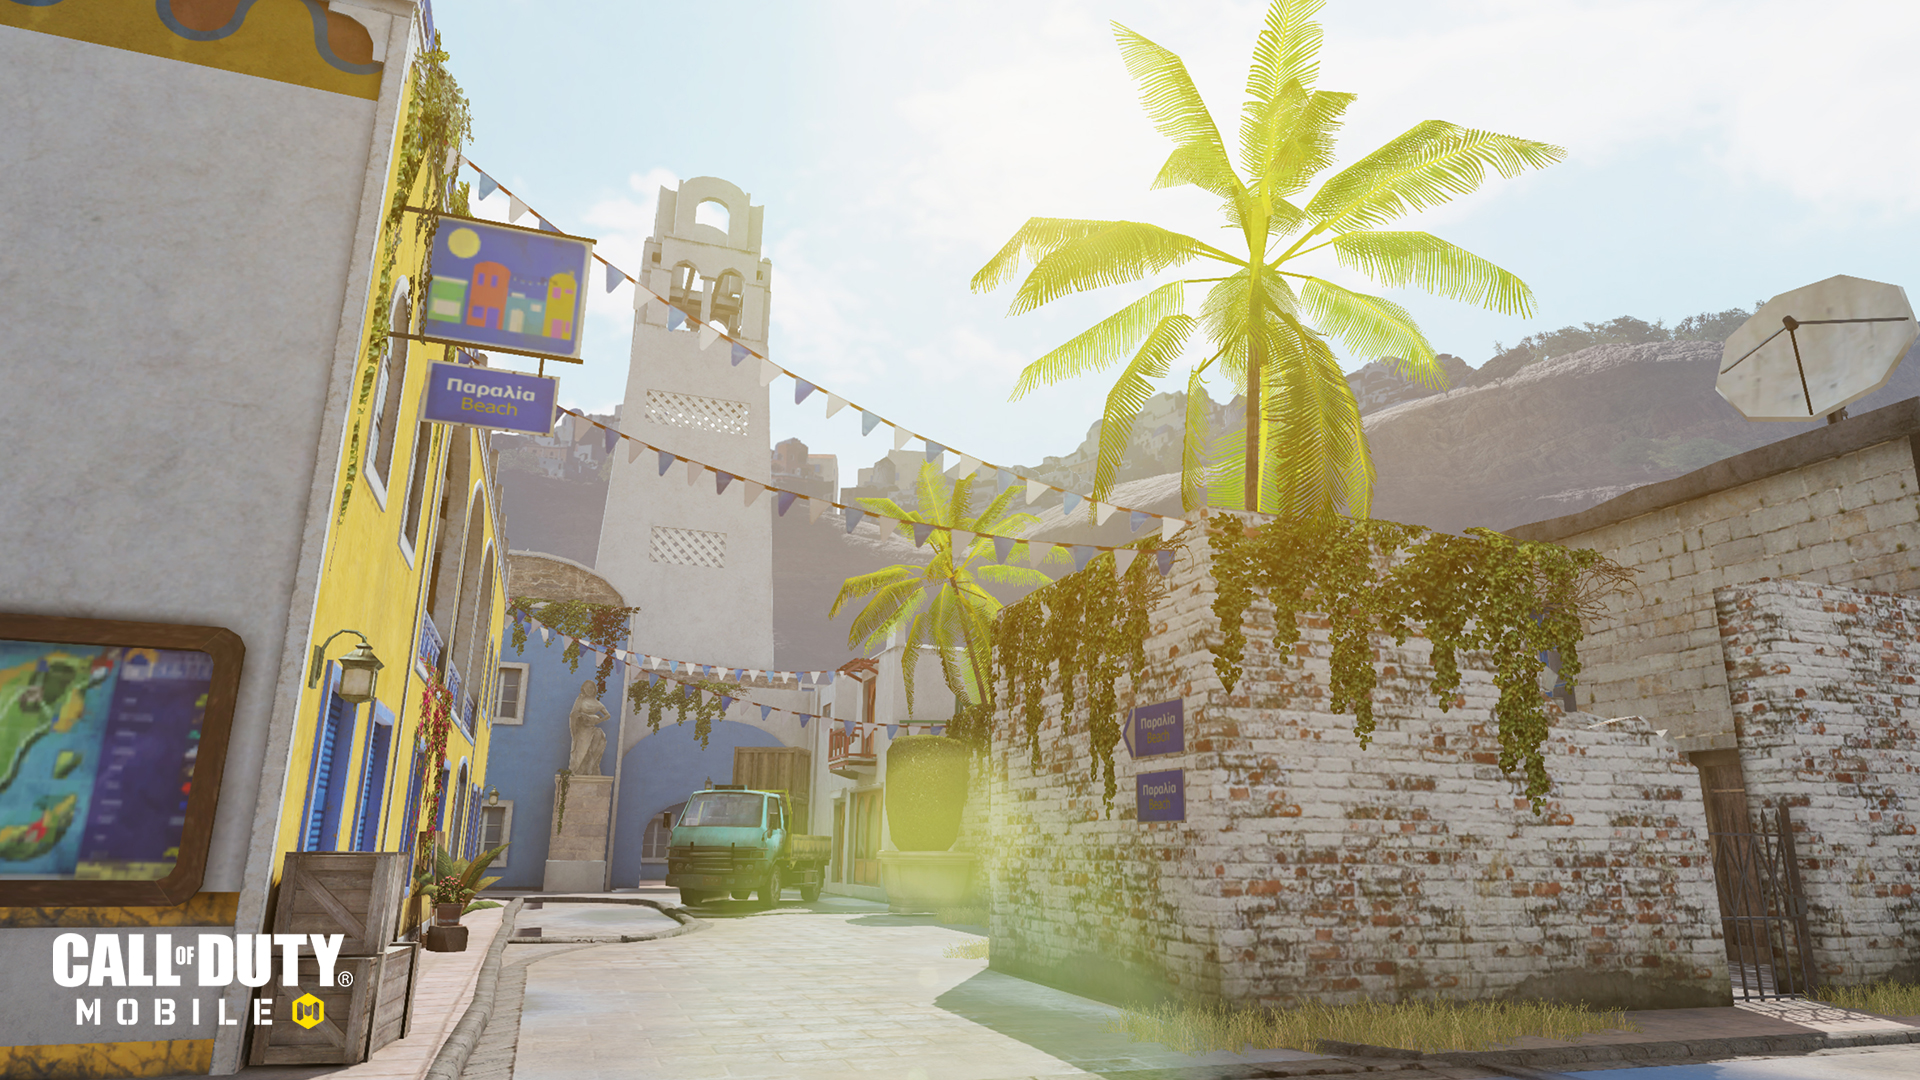 Call of Duty®: Mobile Map Snapshot: Tunisia - Image 6